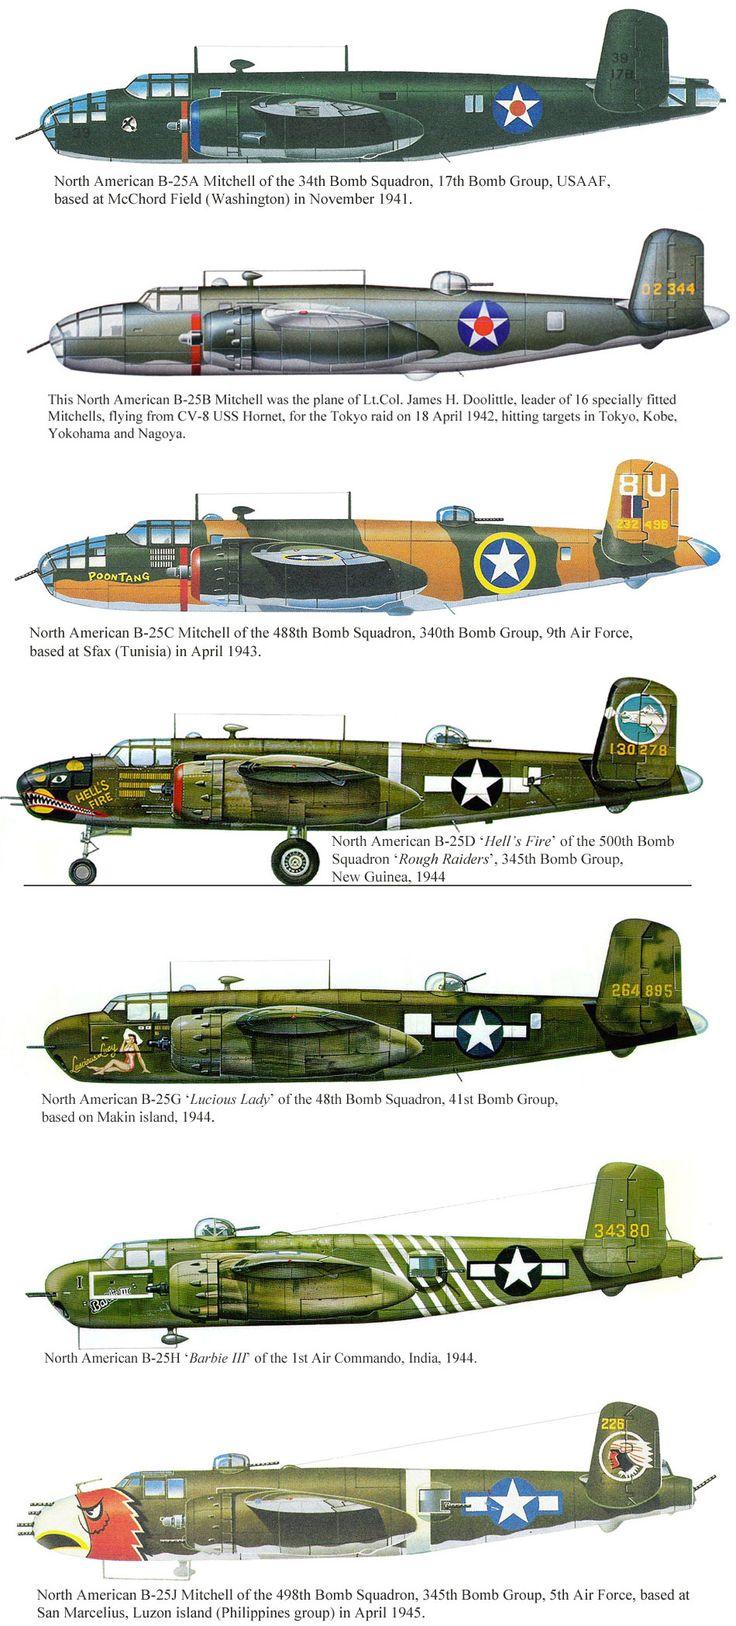 B-25's that my Dad, Walter Ralph Trent, flew in WW II...